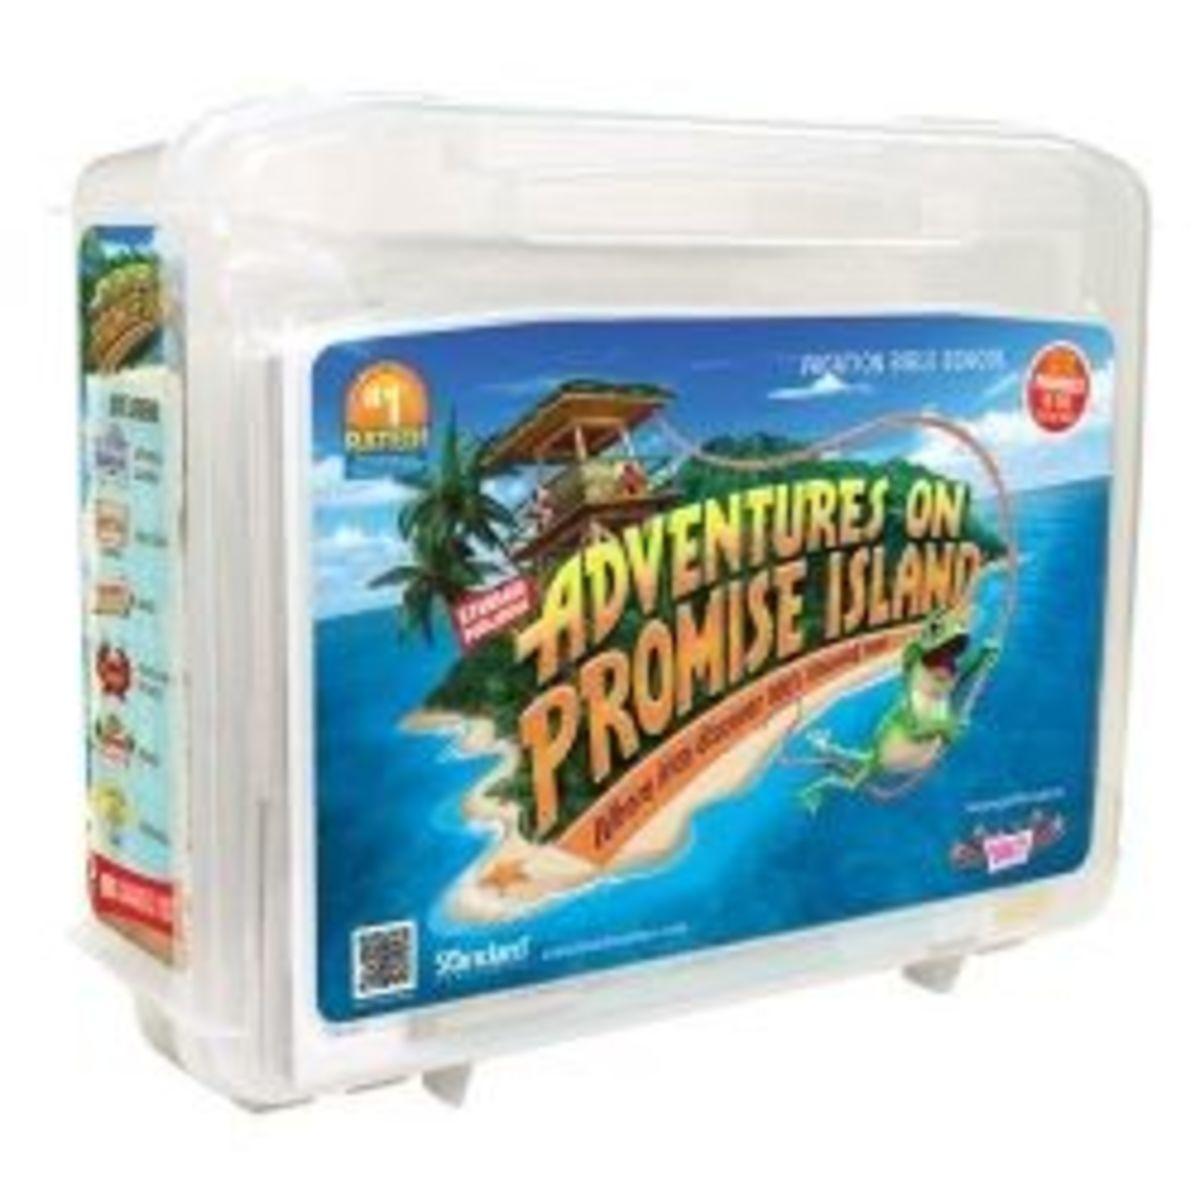 VBS Activities: Adventures on Promise Island